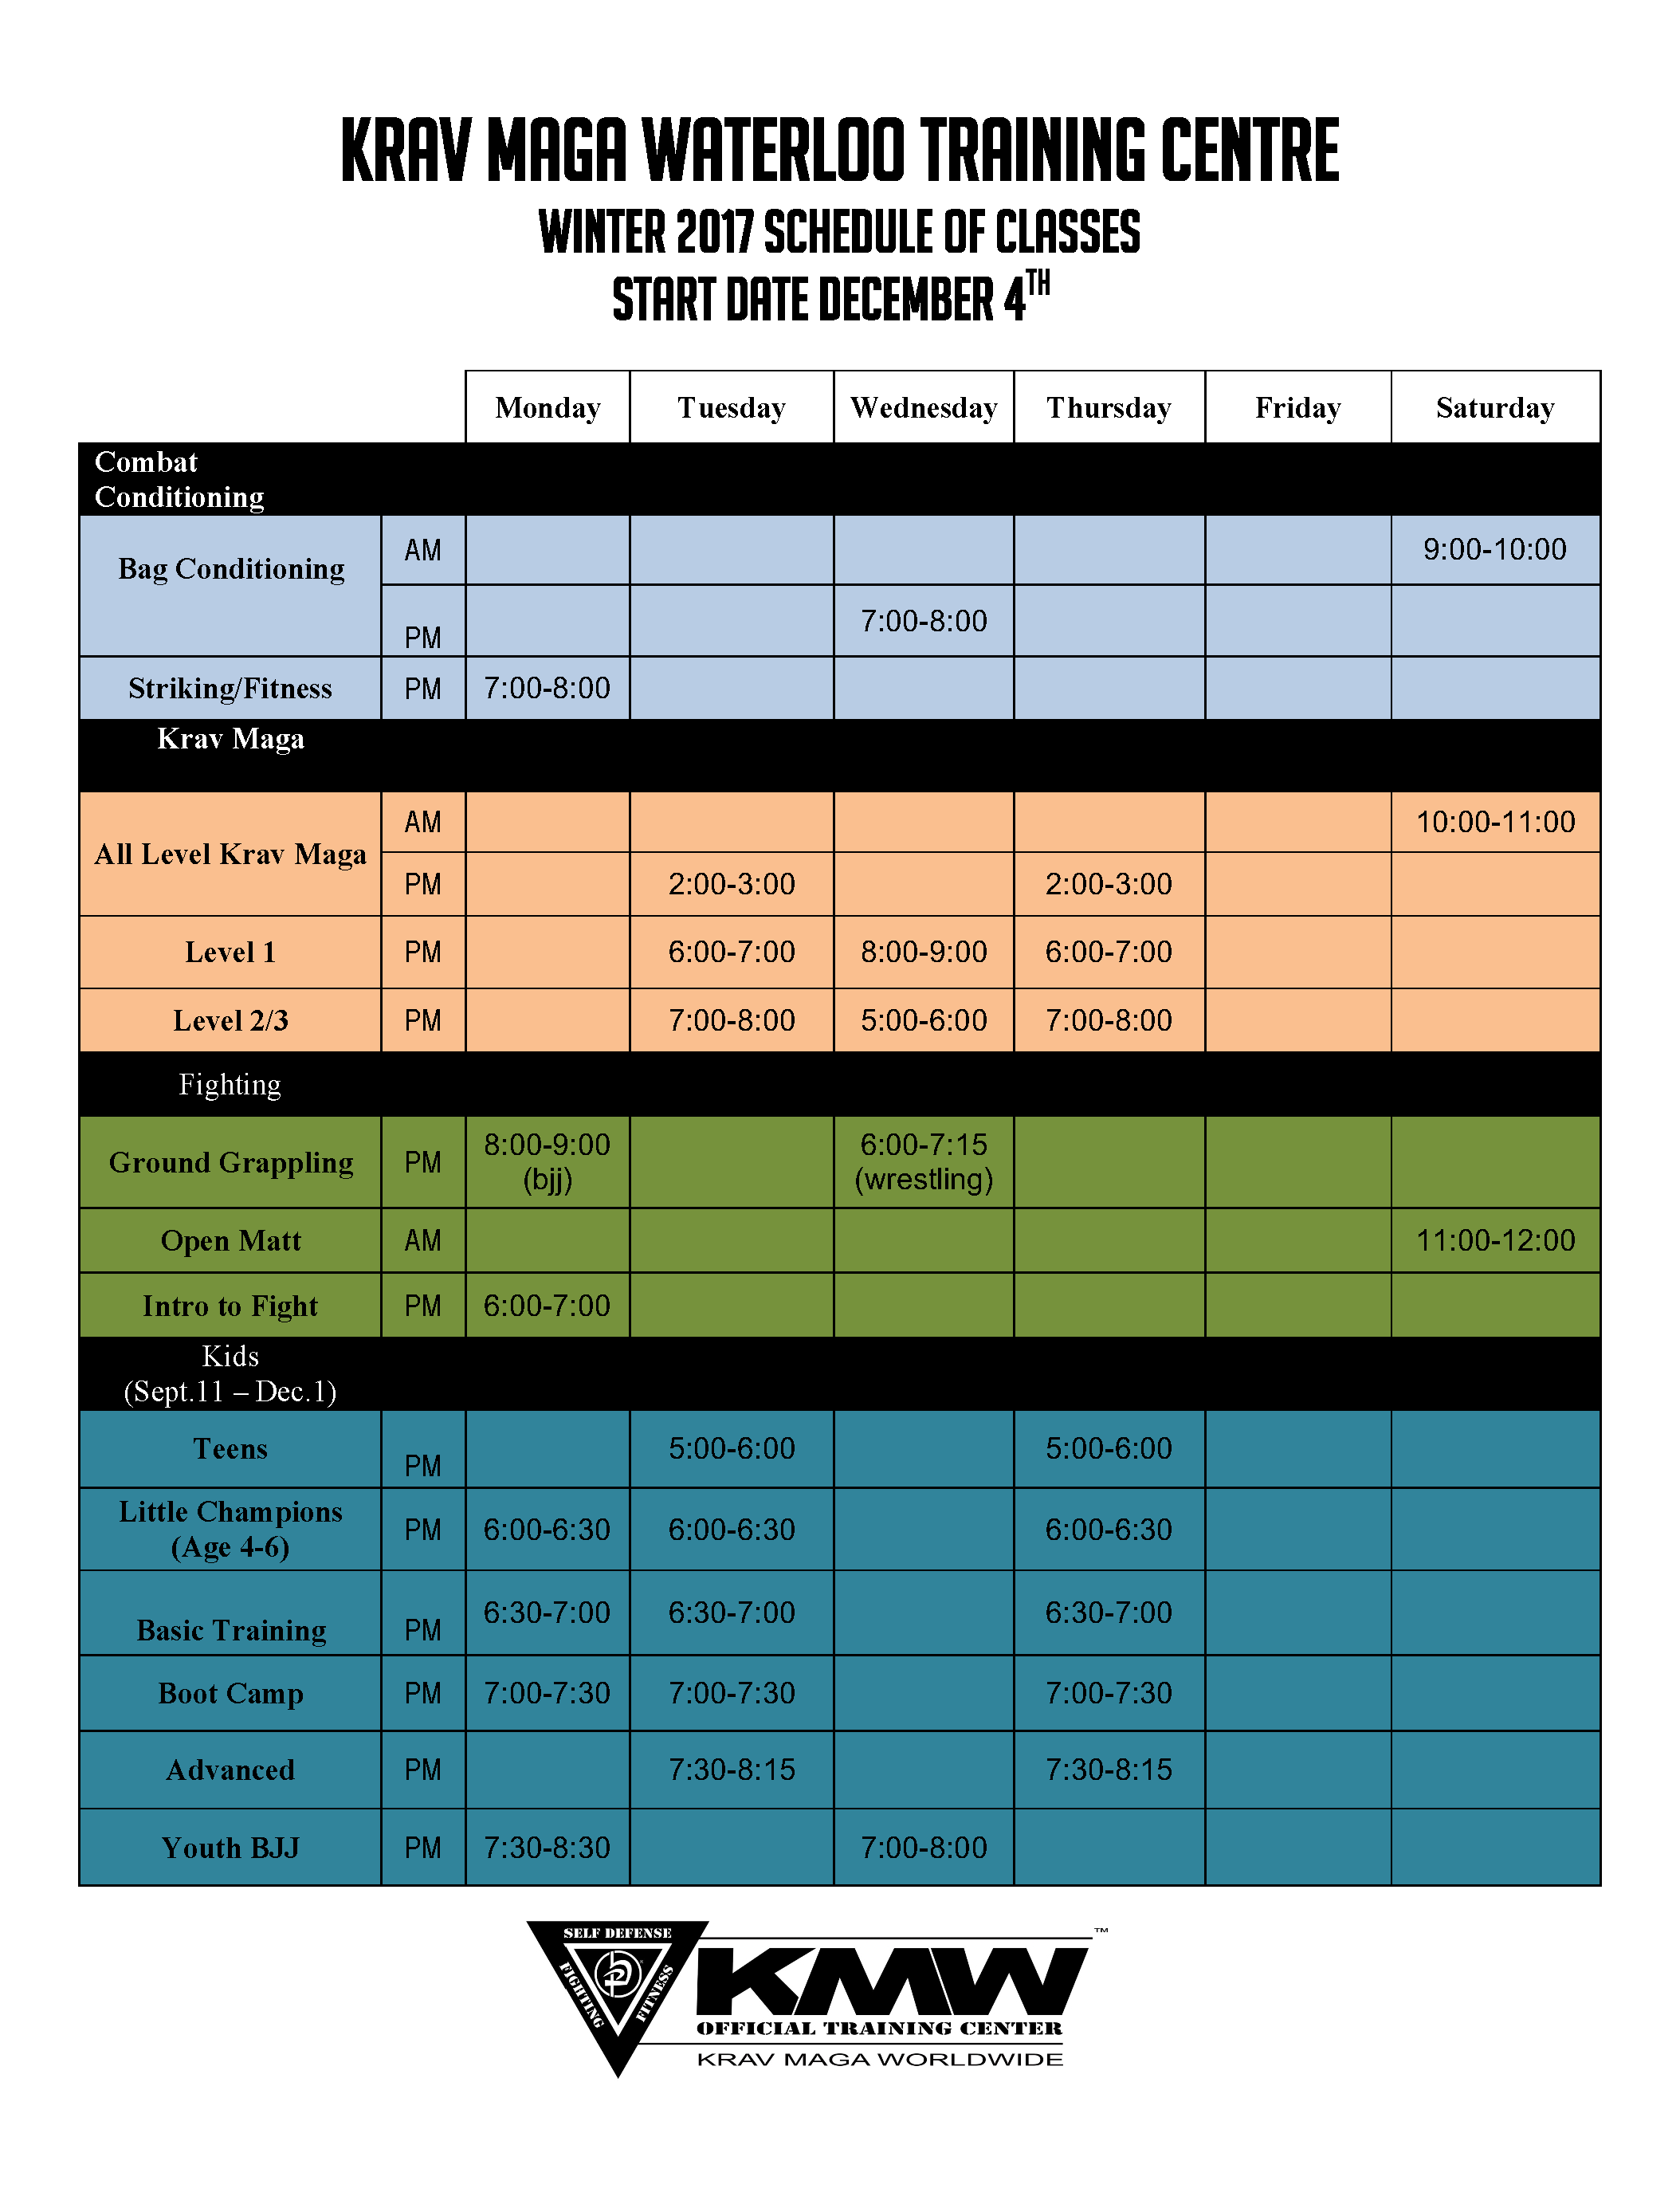 Krav Maga Winter 2017 Schedule